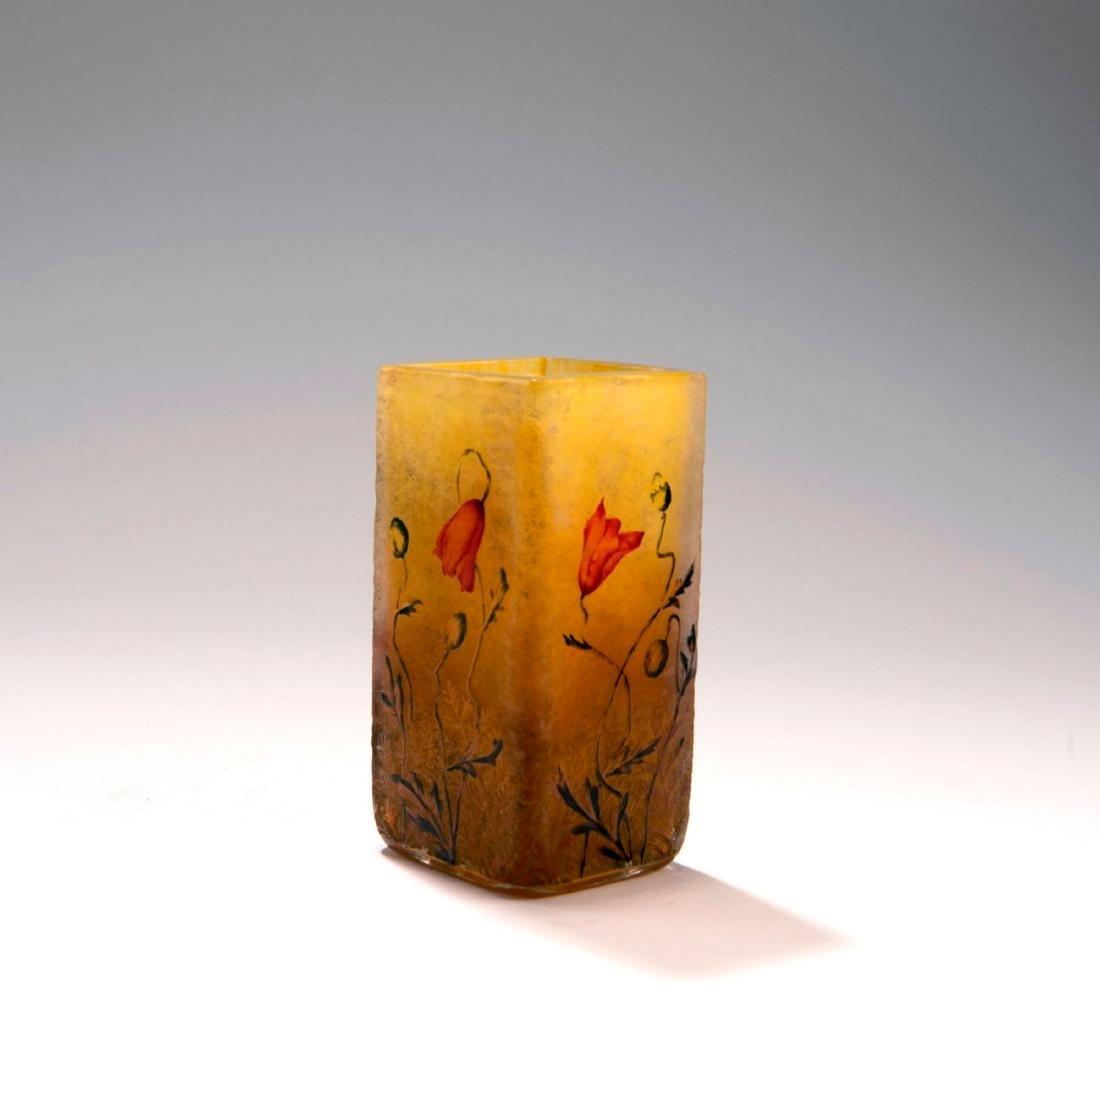 Small 'Coquelicots' vase, c. 1900 - 2